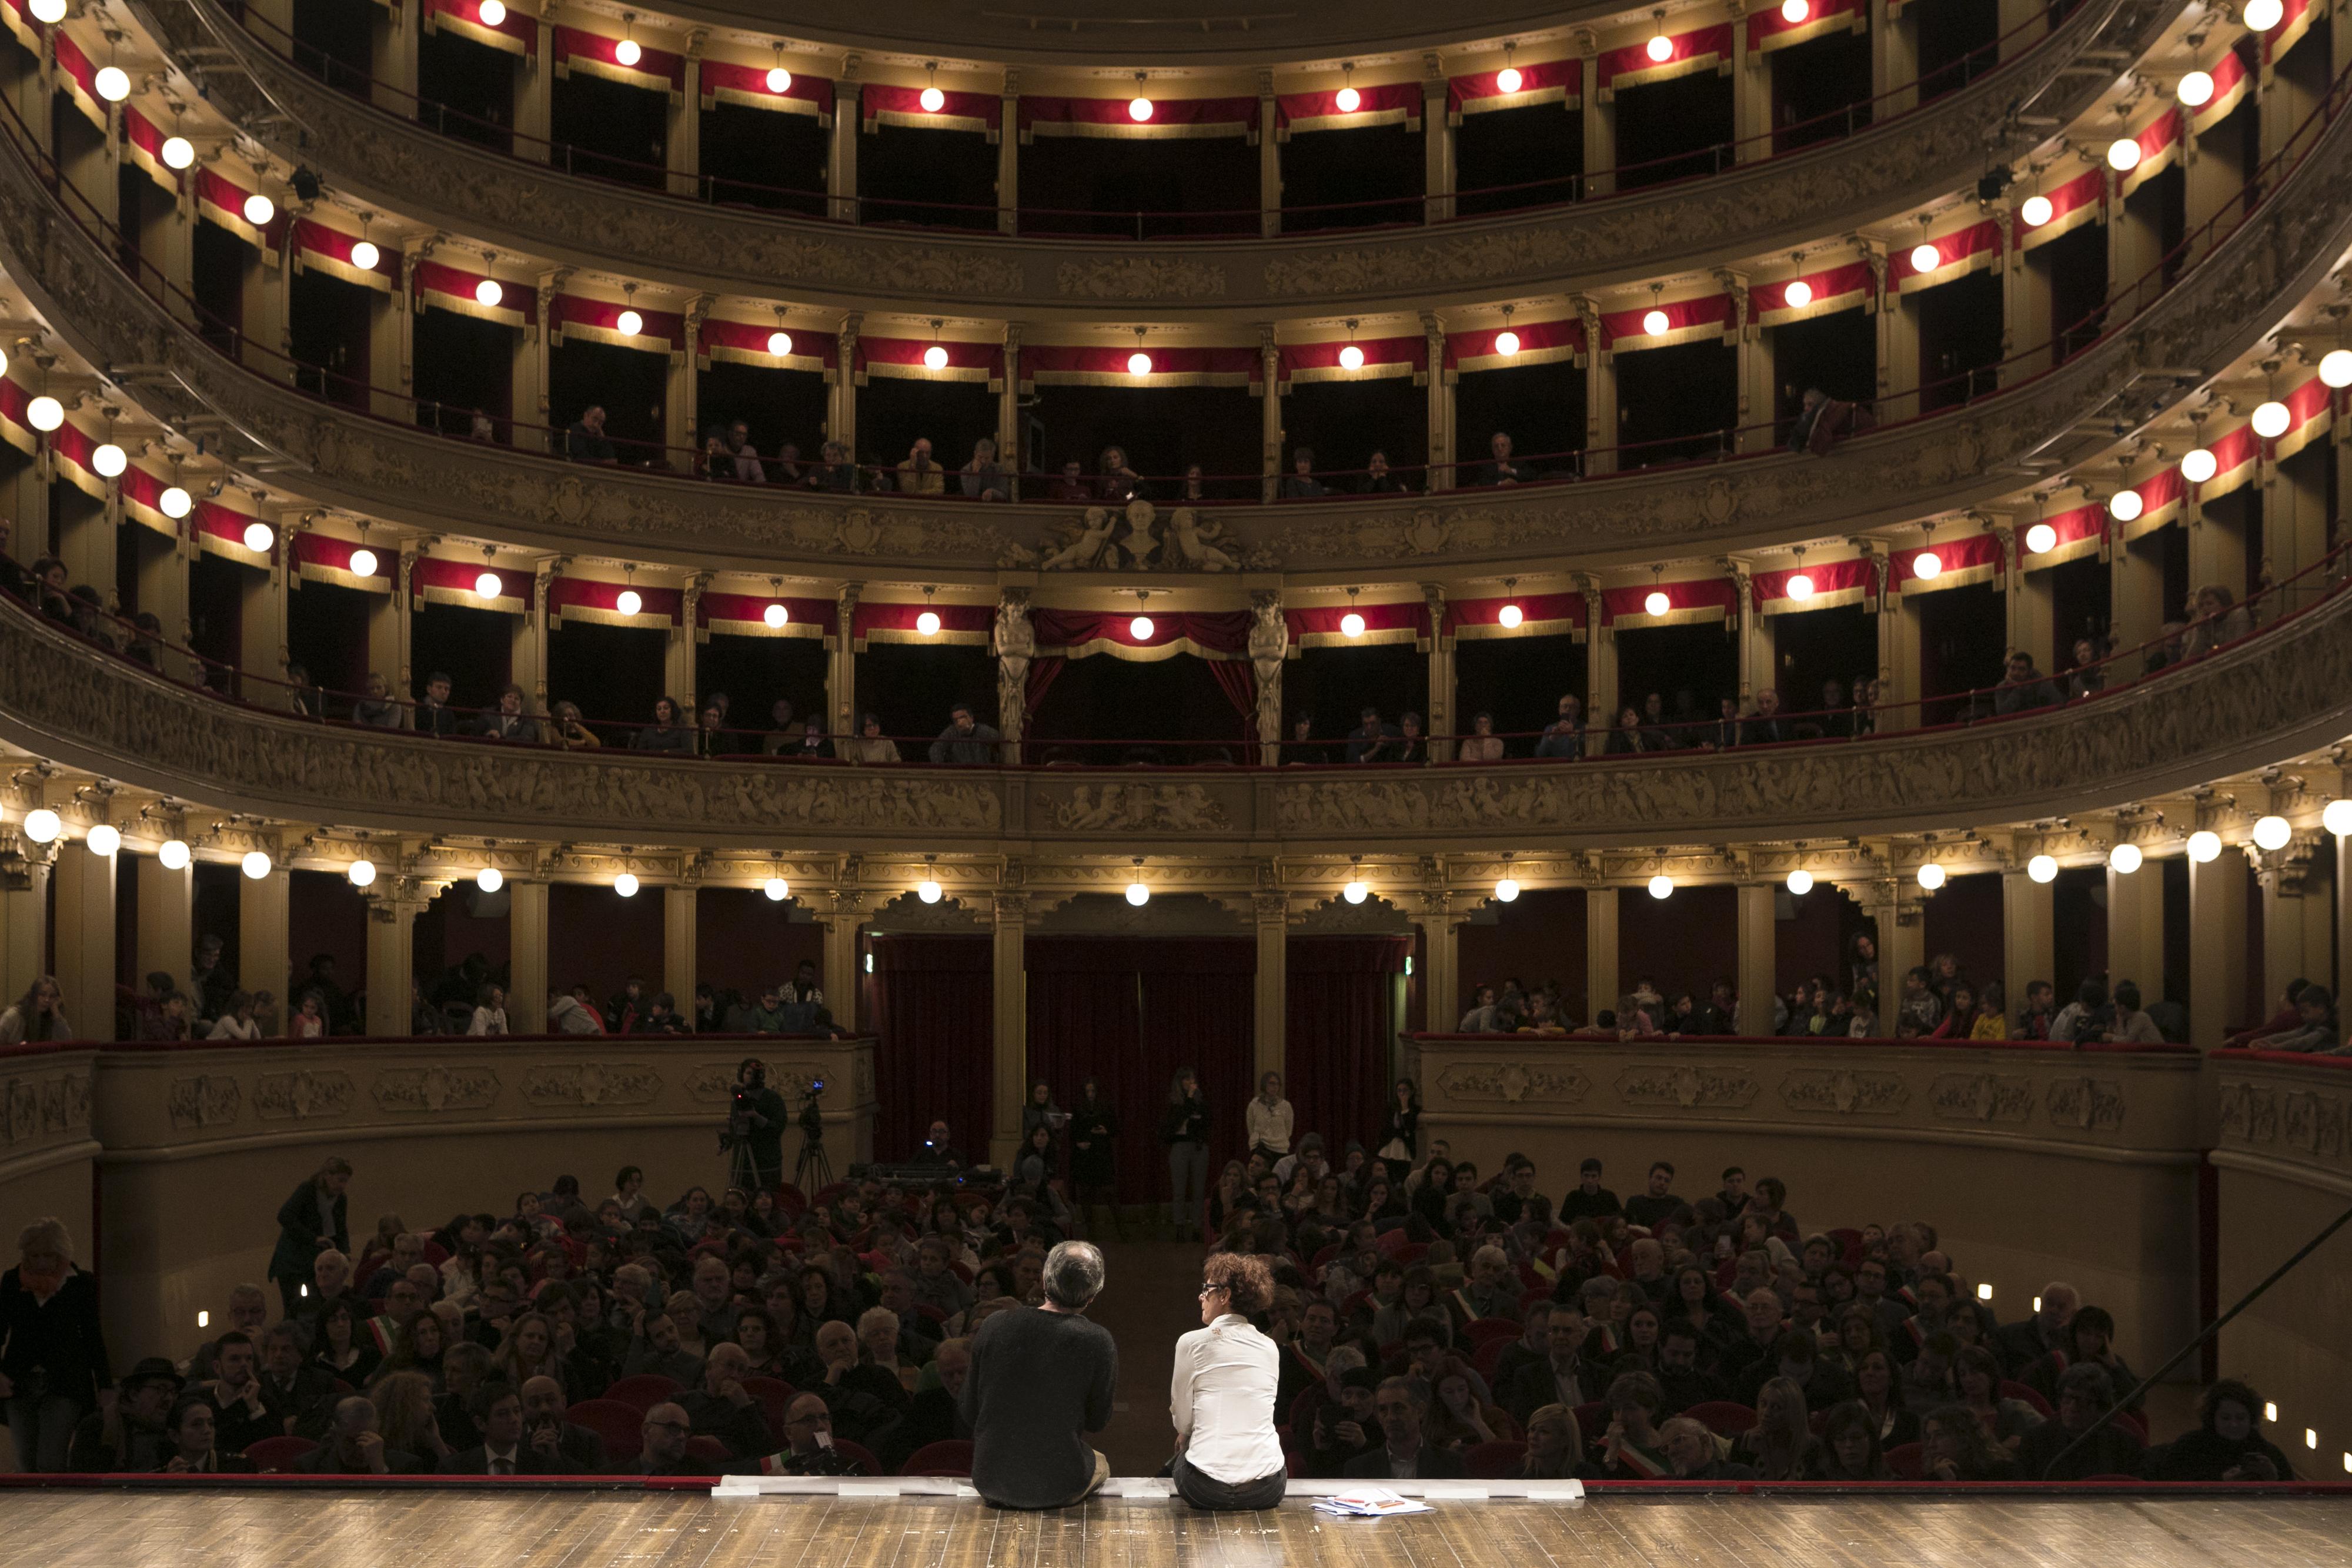 Rocco Papaleo - Teatro Alfieri, Asti - courtesy Regione Piemonte